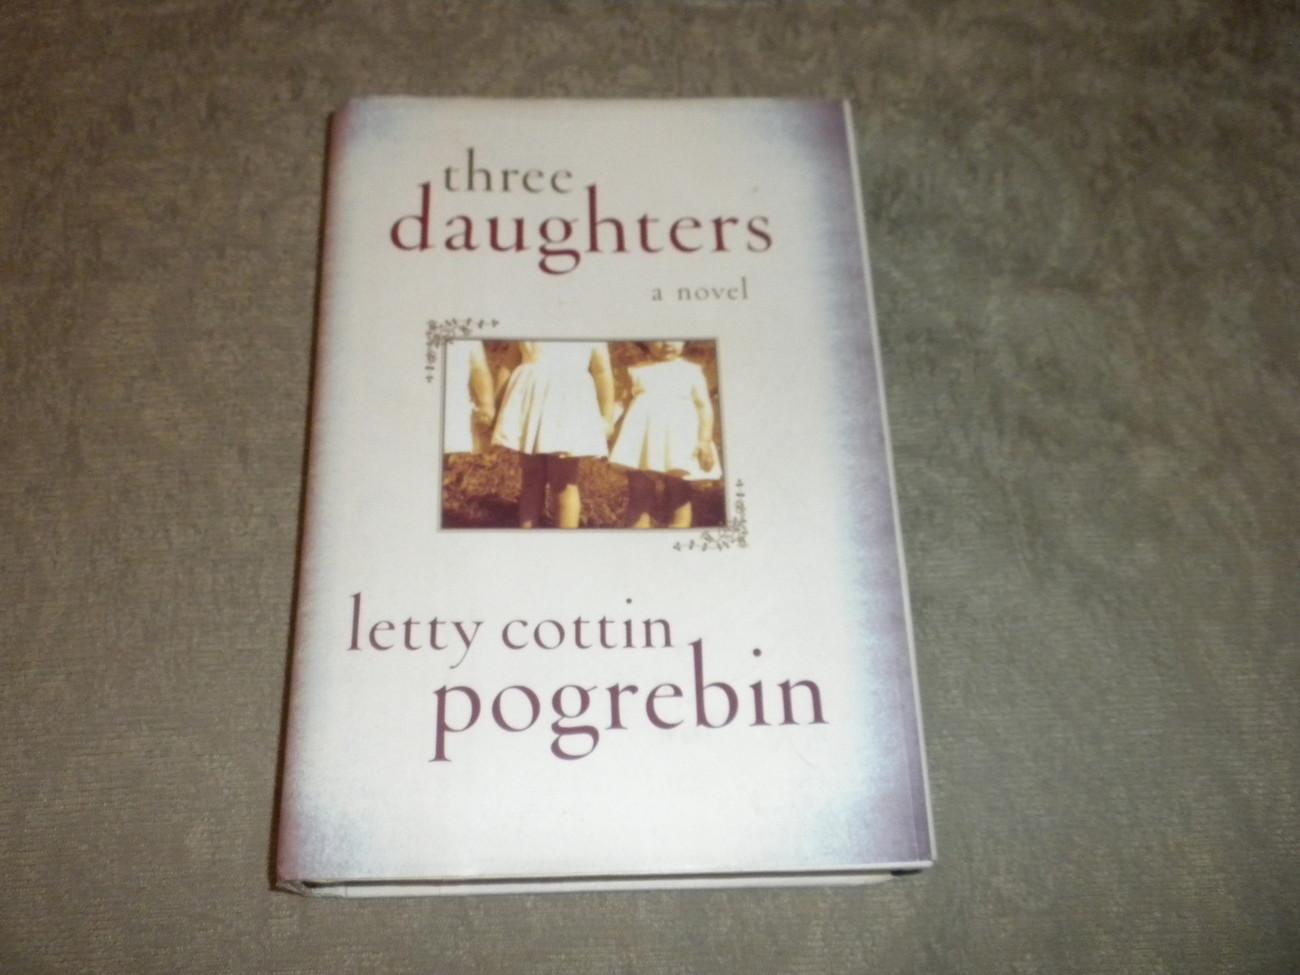 Three Daughters by Letty Cottin Pogrebin HC w DJ 1st Ed w full number line 2002